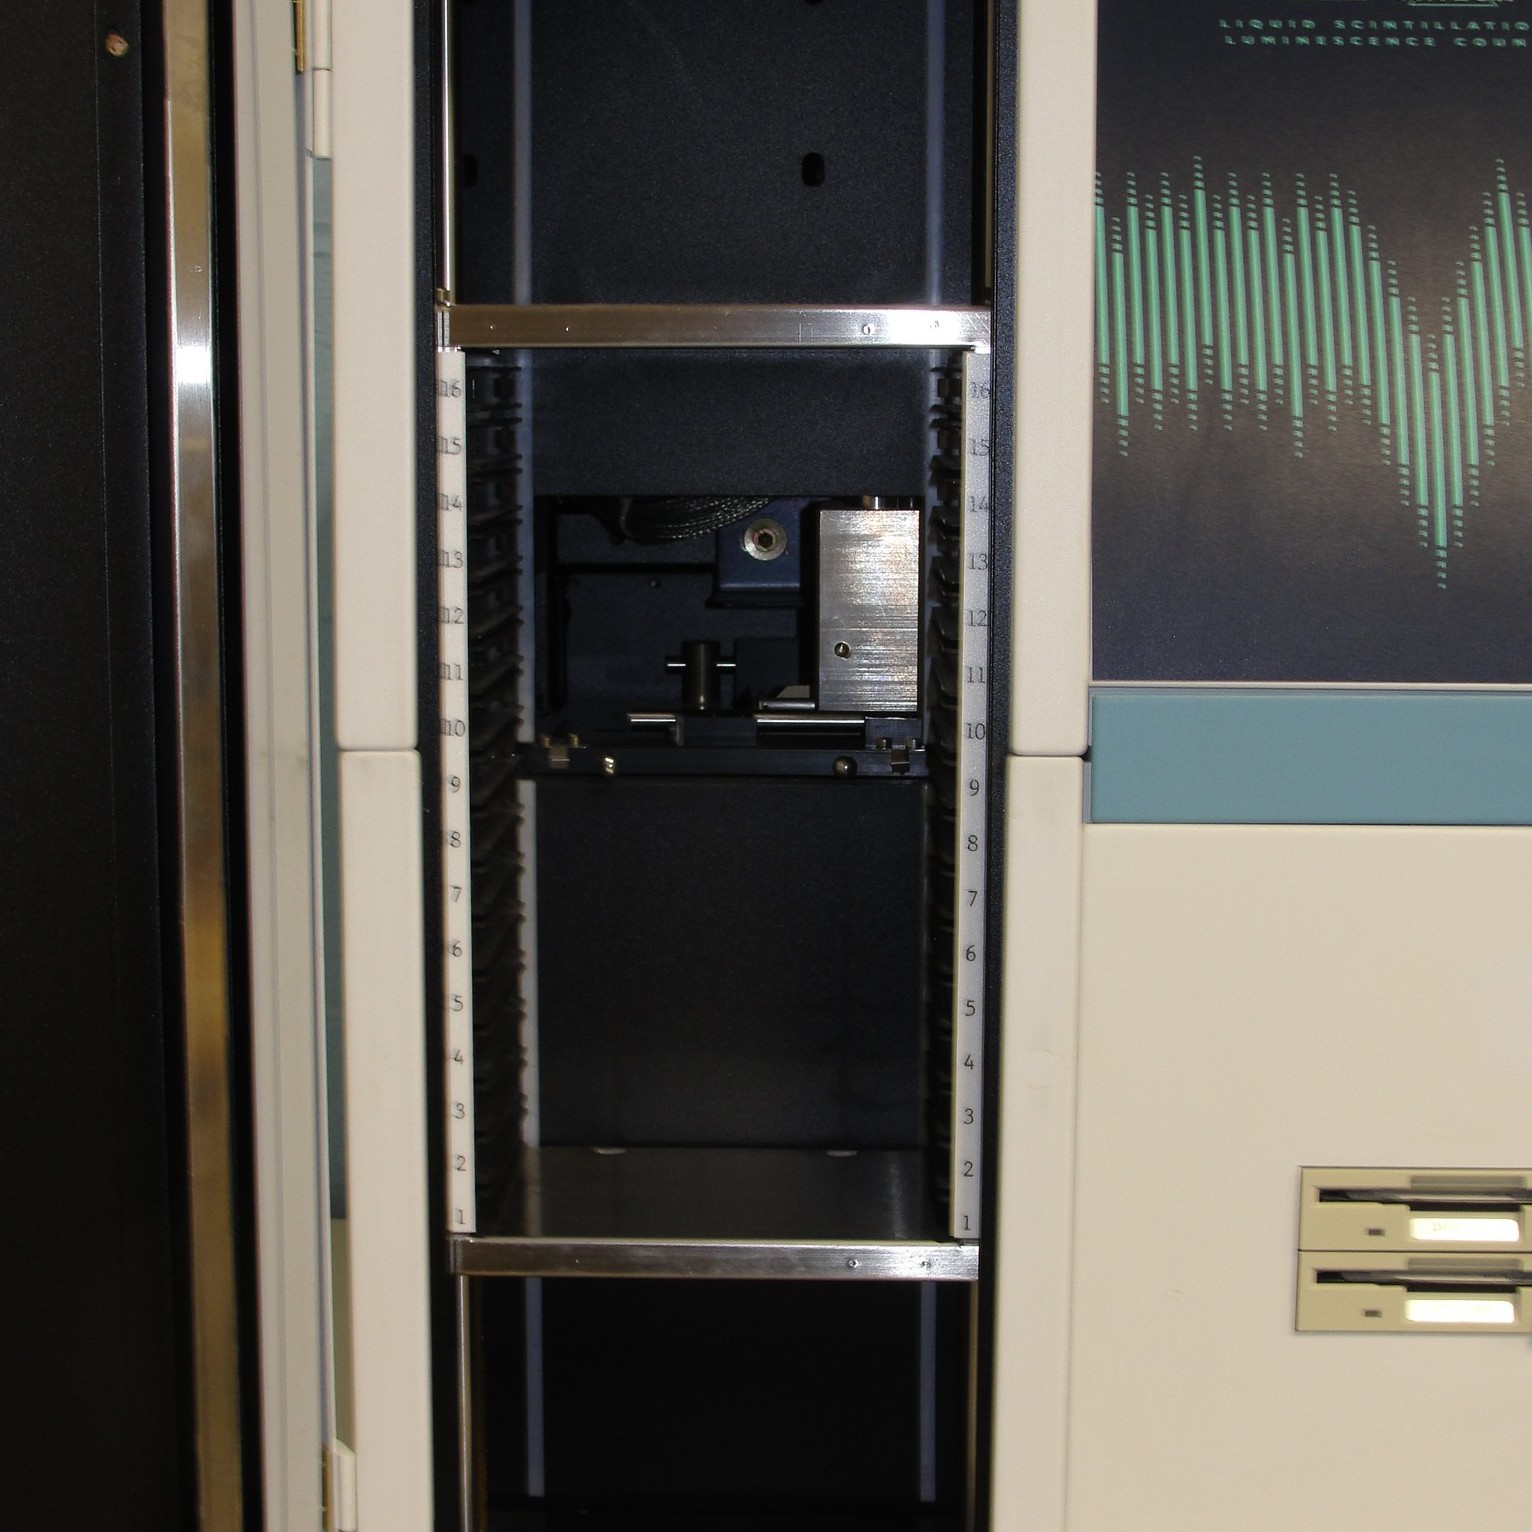 PerkinElmer/Wallac 1450-021 Trilux MicroBeta Liquid Scintillation and Luminescence Counter Image